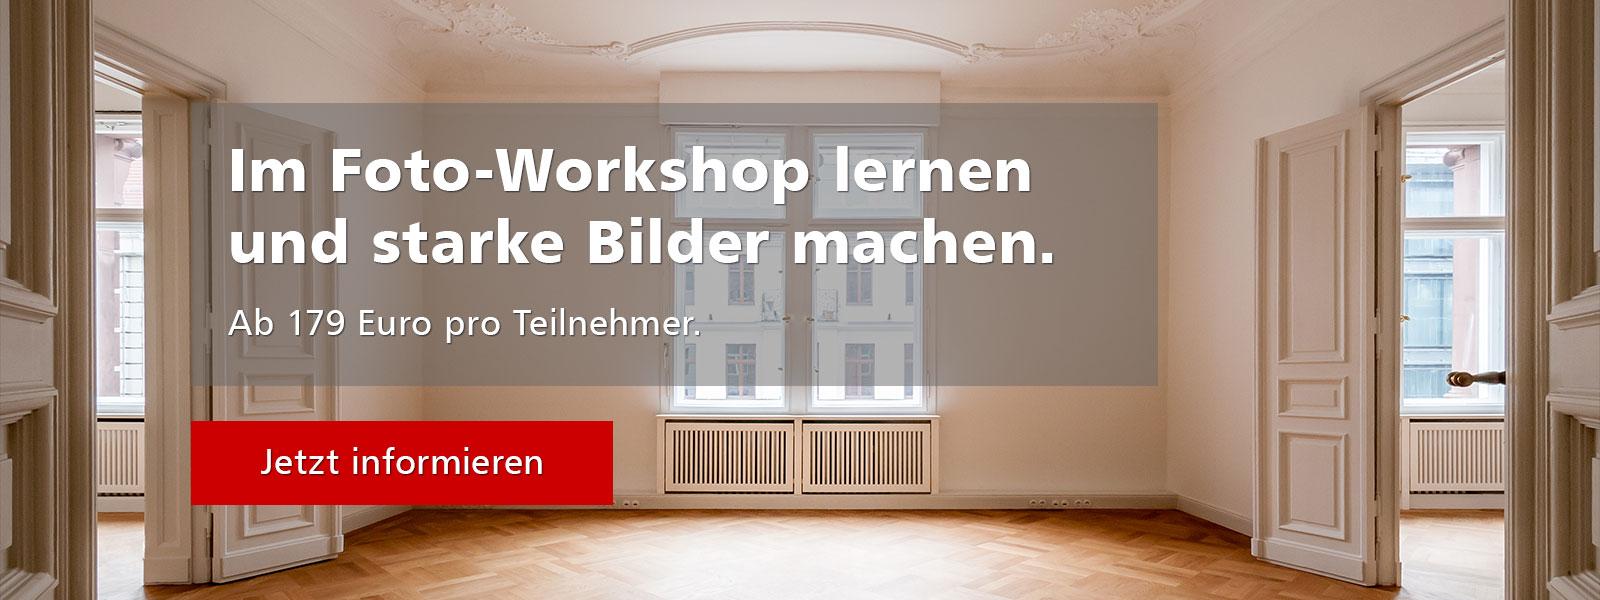 Workshop Immobilienfotografie ab 179 EUR pro Teilnehmer